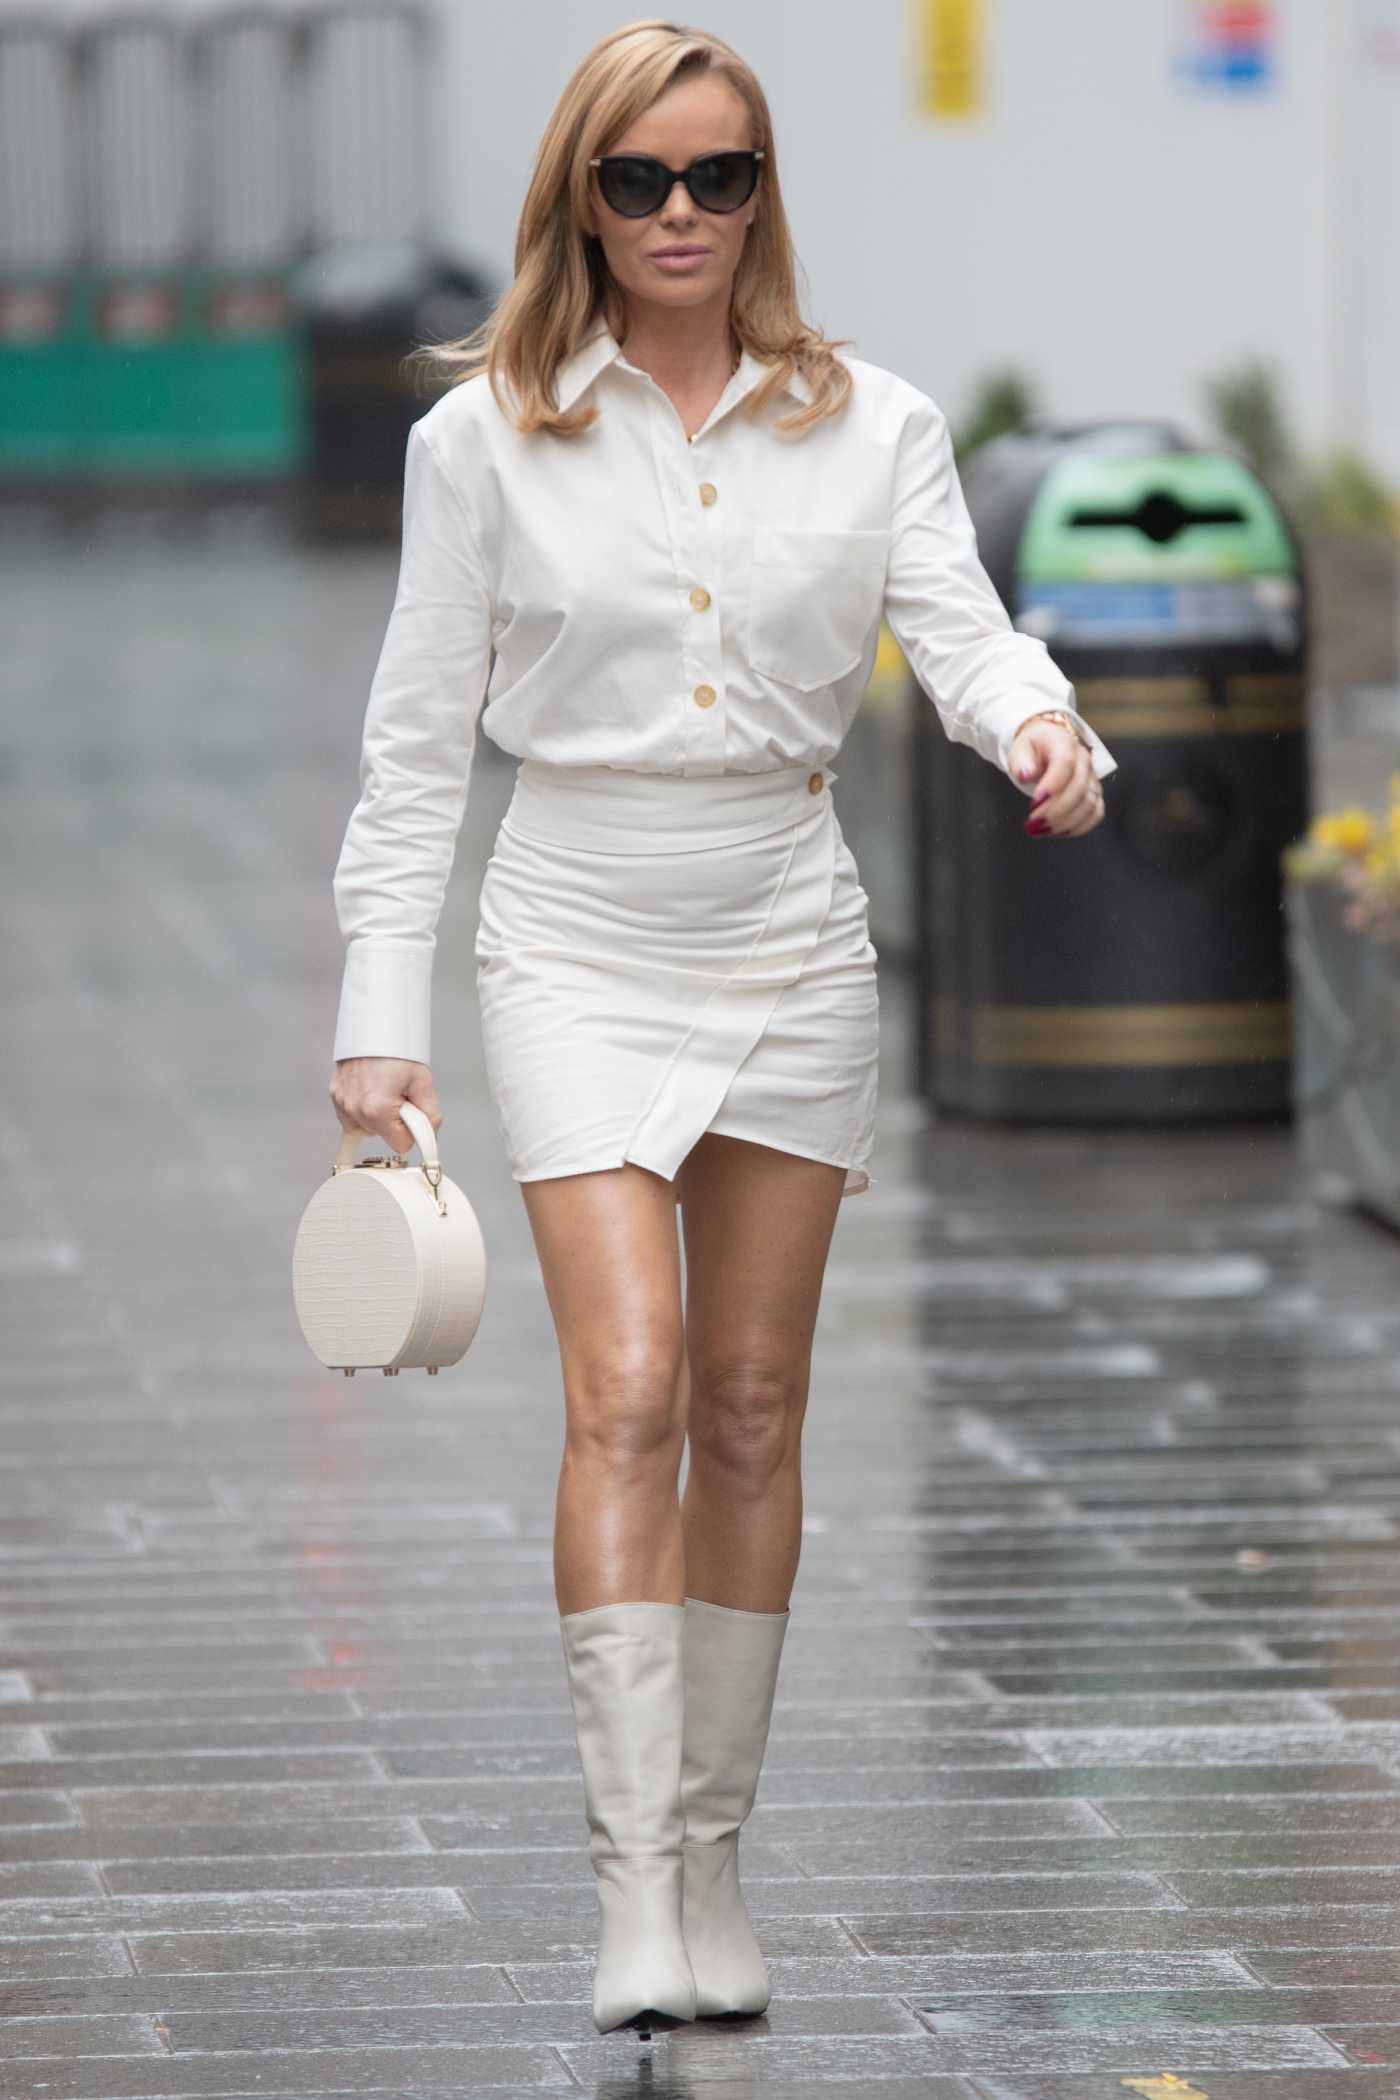 Amanda Holden in a White Mini Skirt Arrives at the Heart Radio in London 02/25/2021